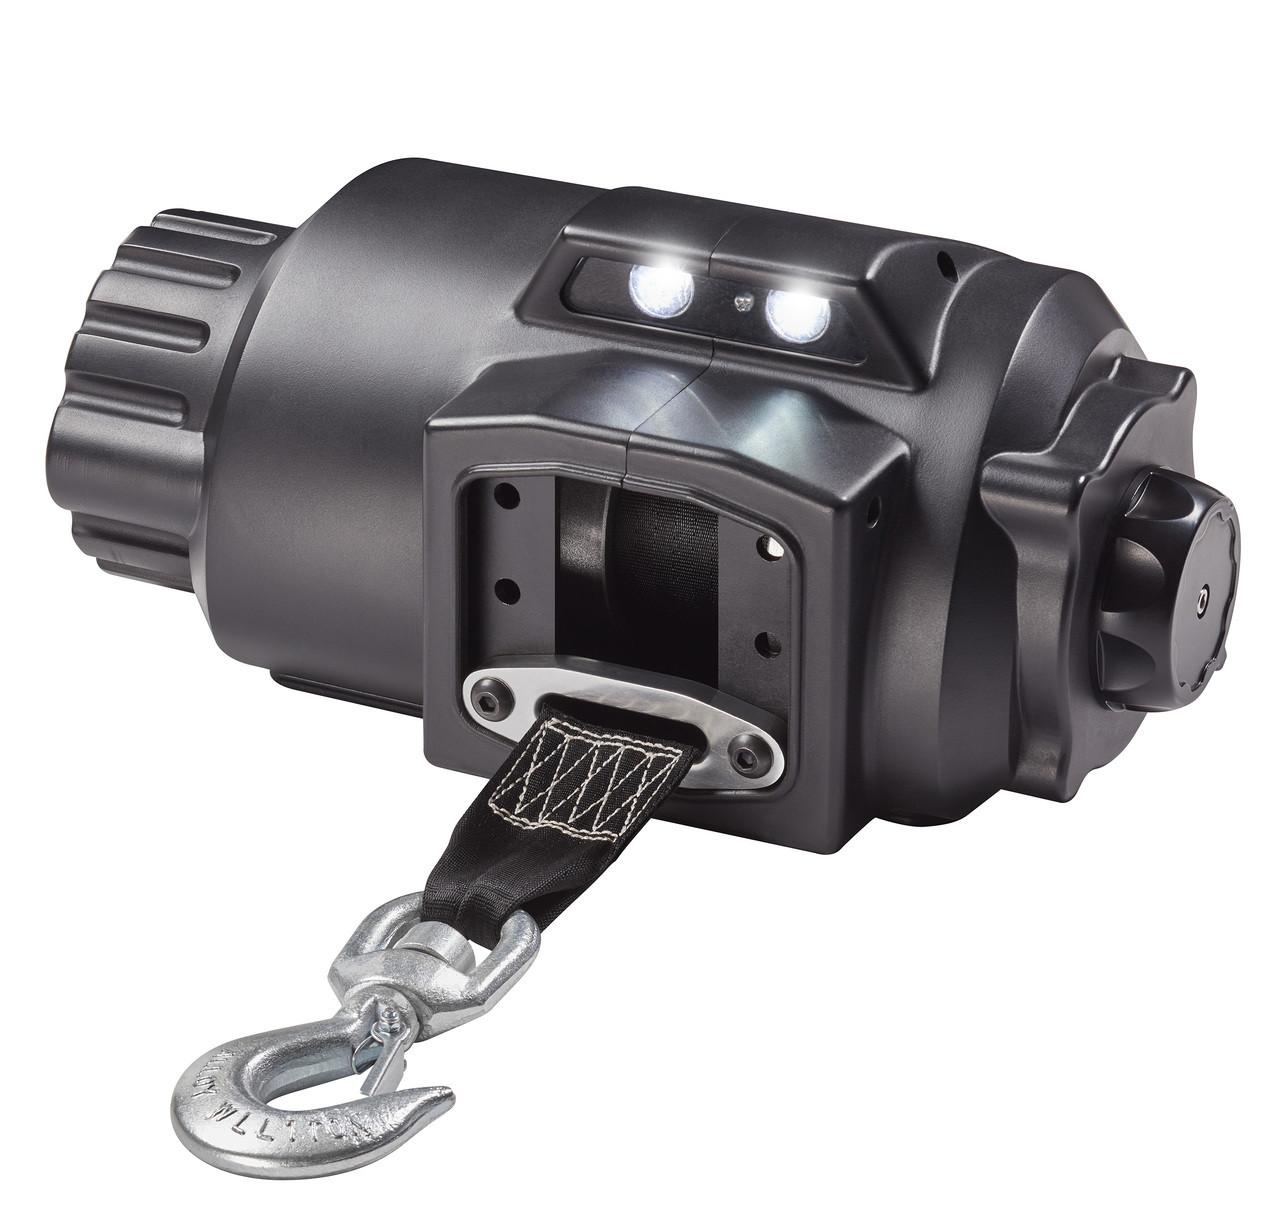 500620 --- FULTON Electric Marine Winch, 7000 lb Capacity